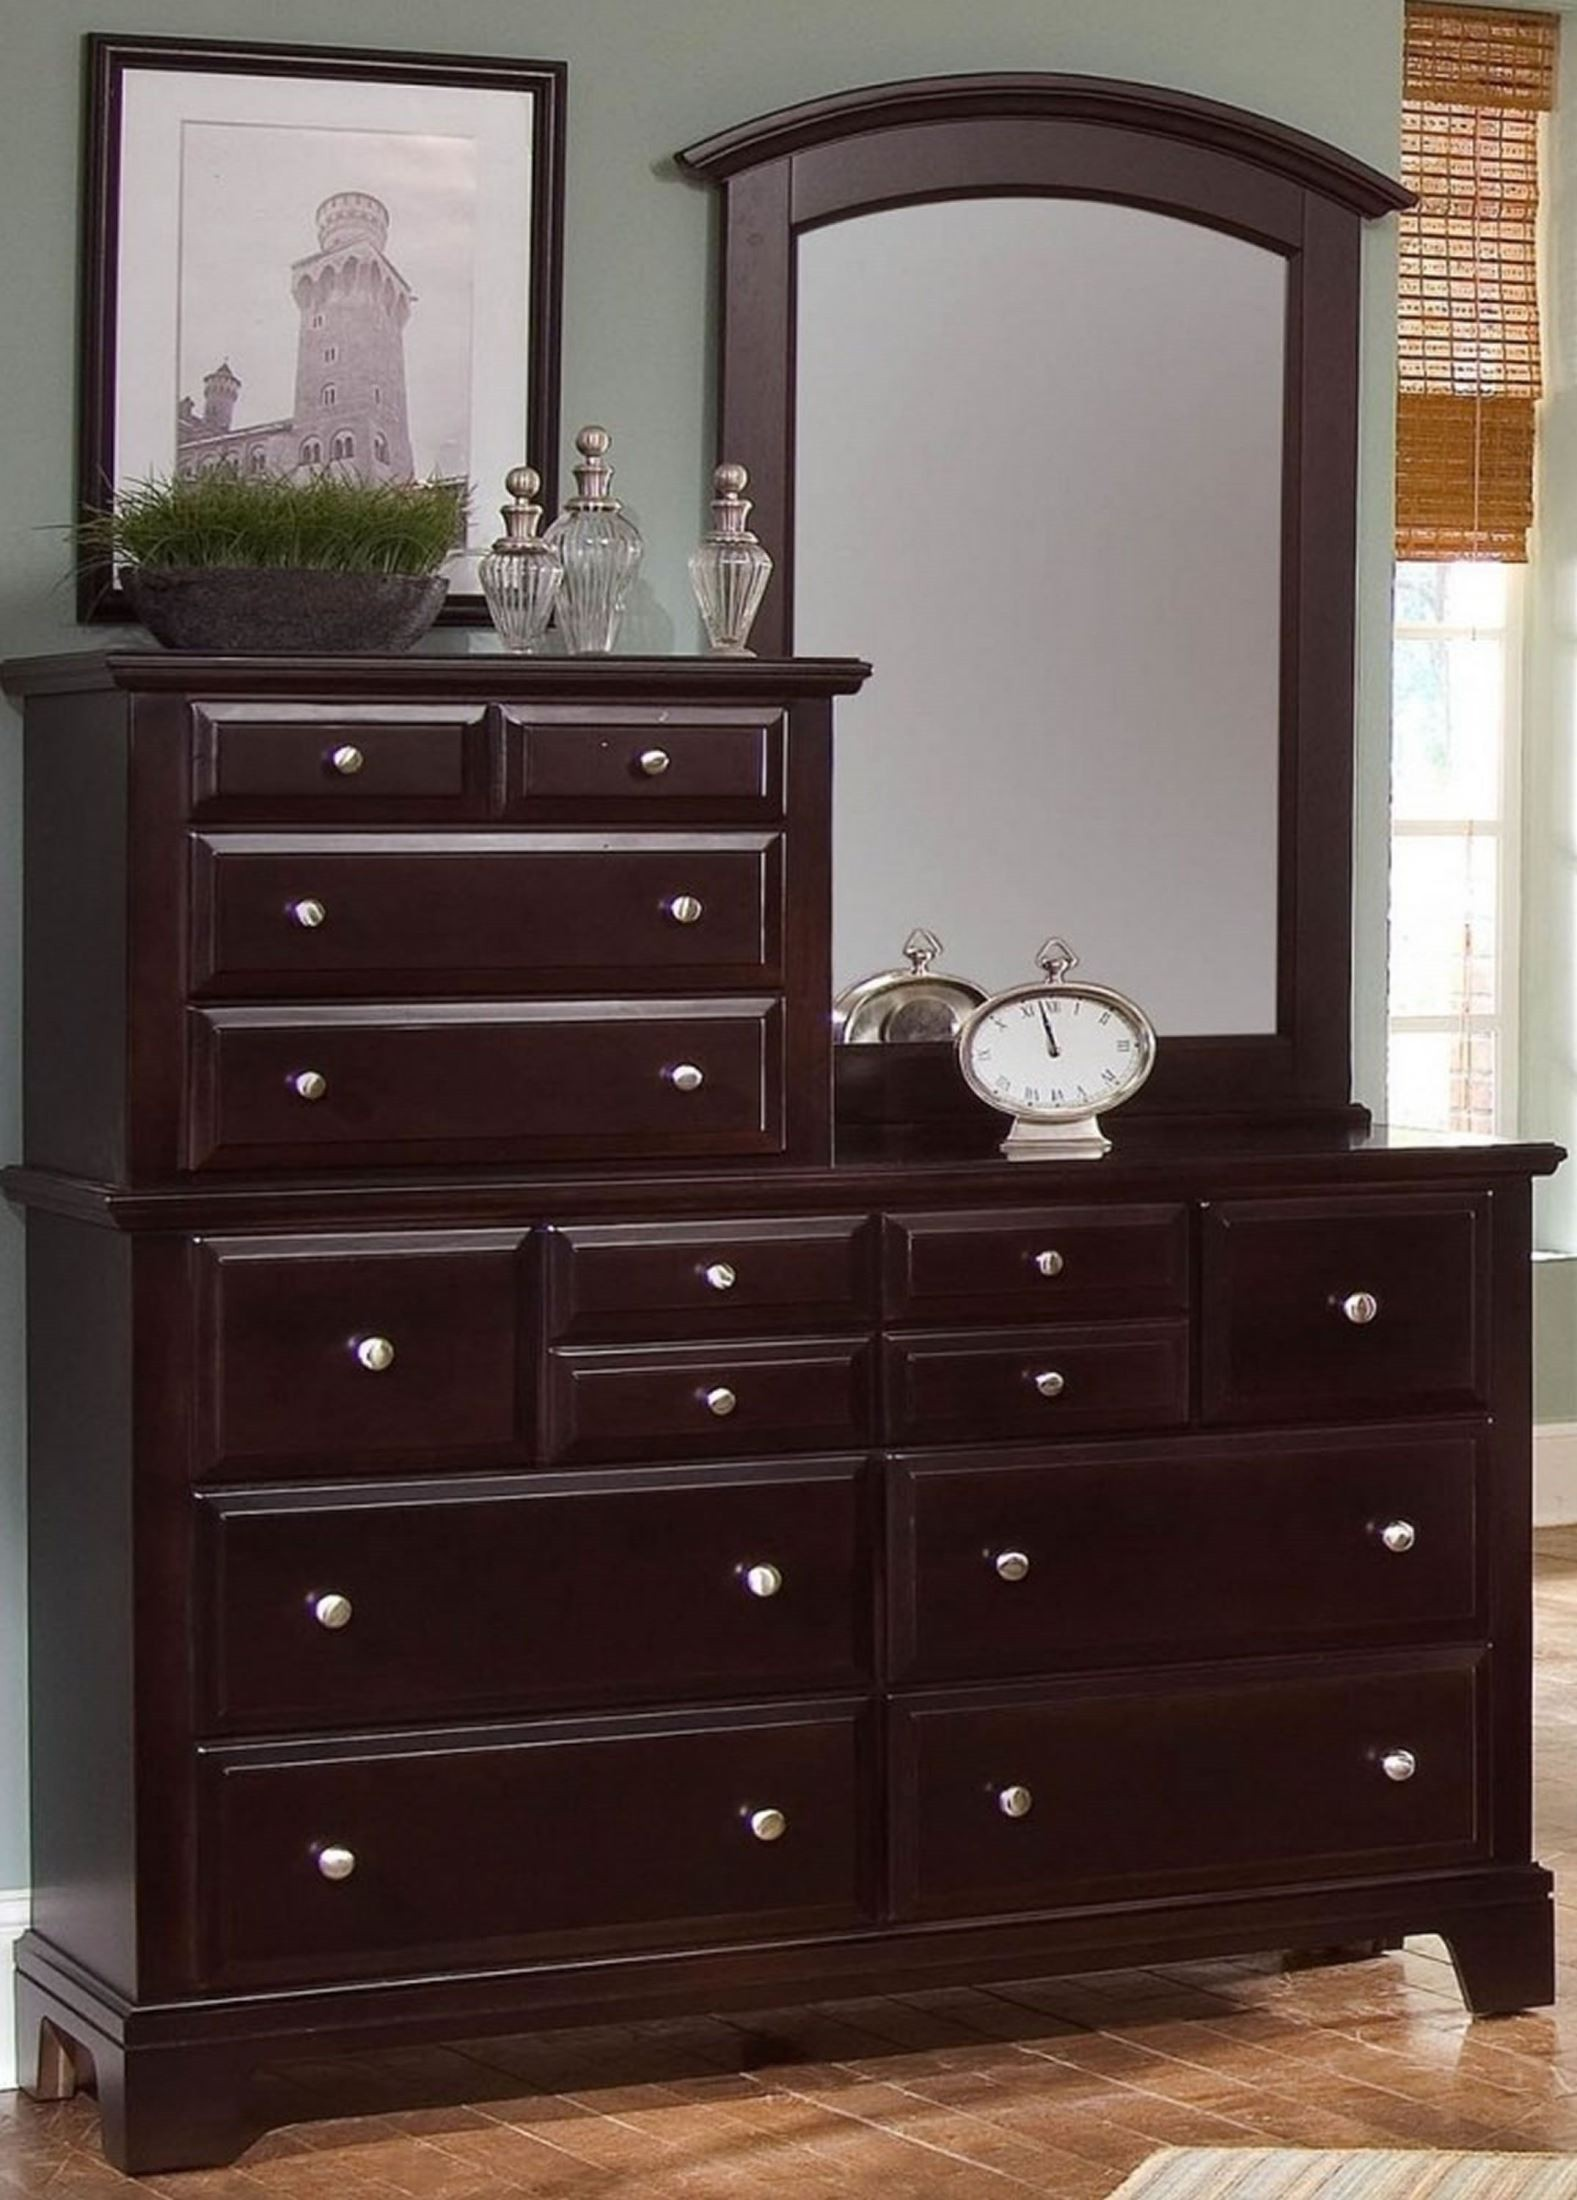 HamiltonFranklin Merlot 10 Drawer Vanity Dresser from Virginia House  Coleman Furniture